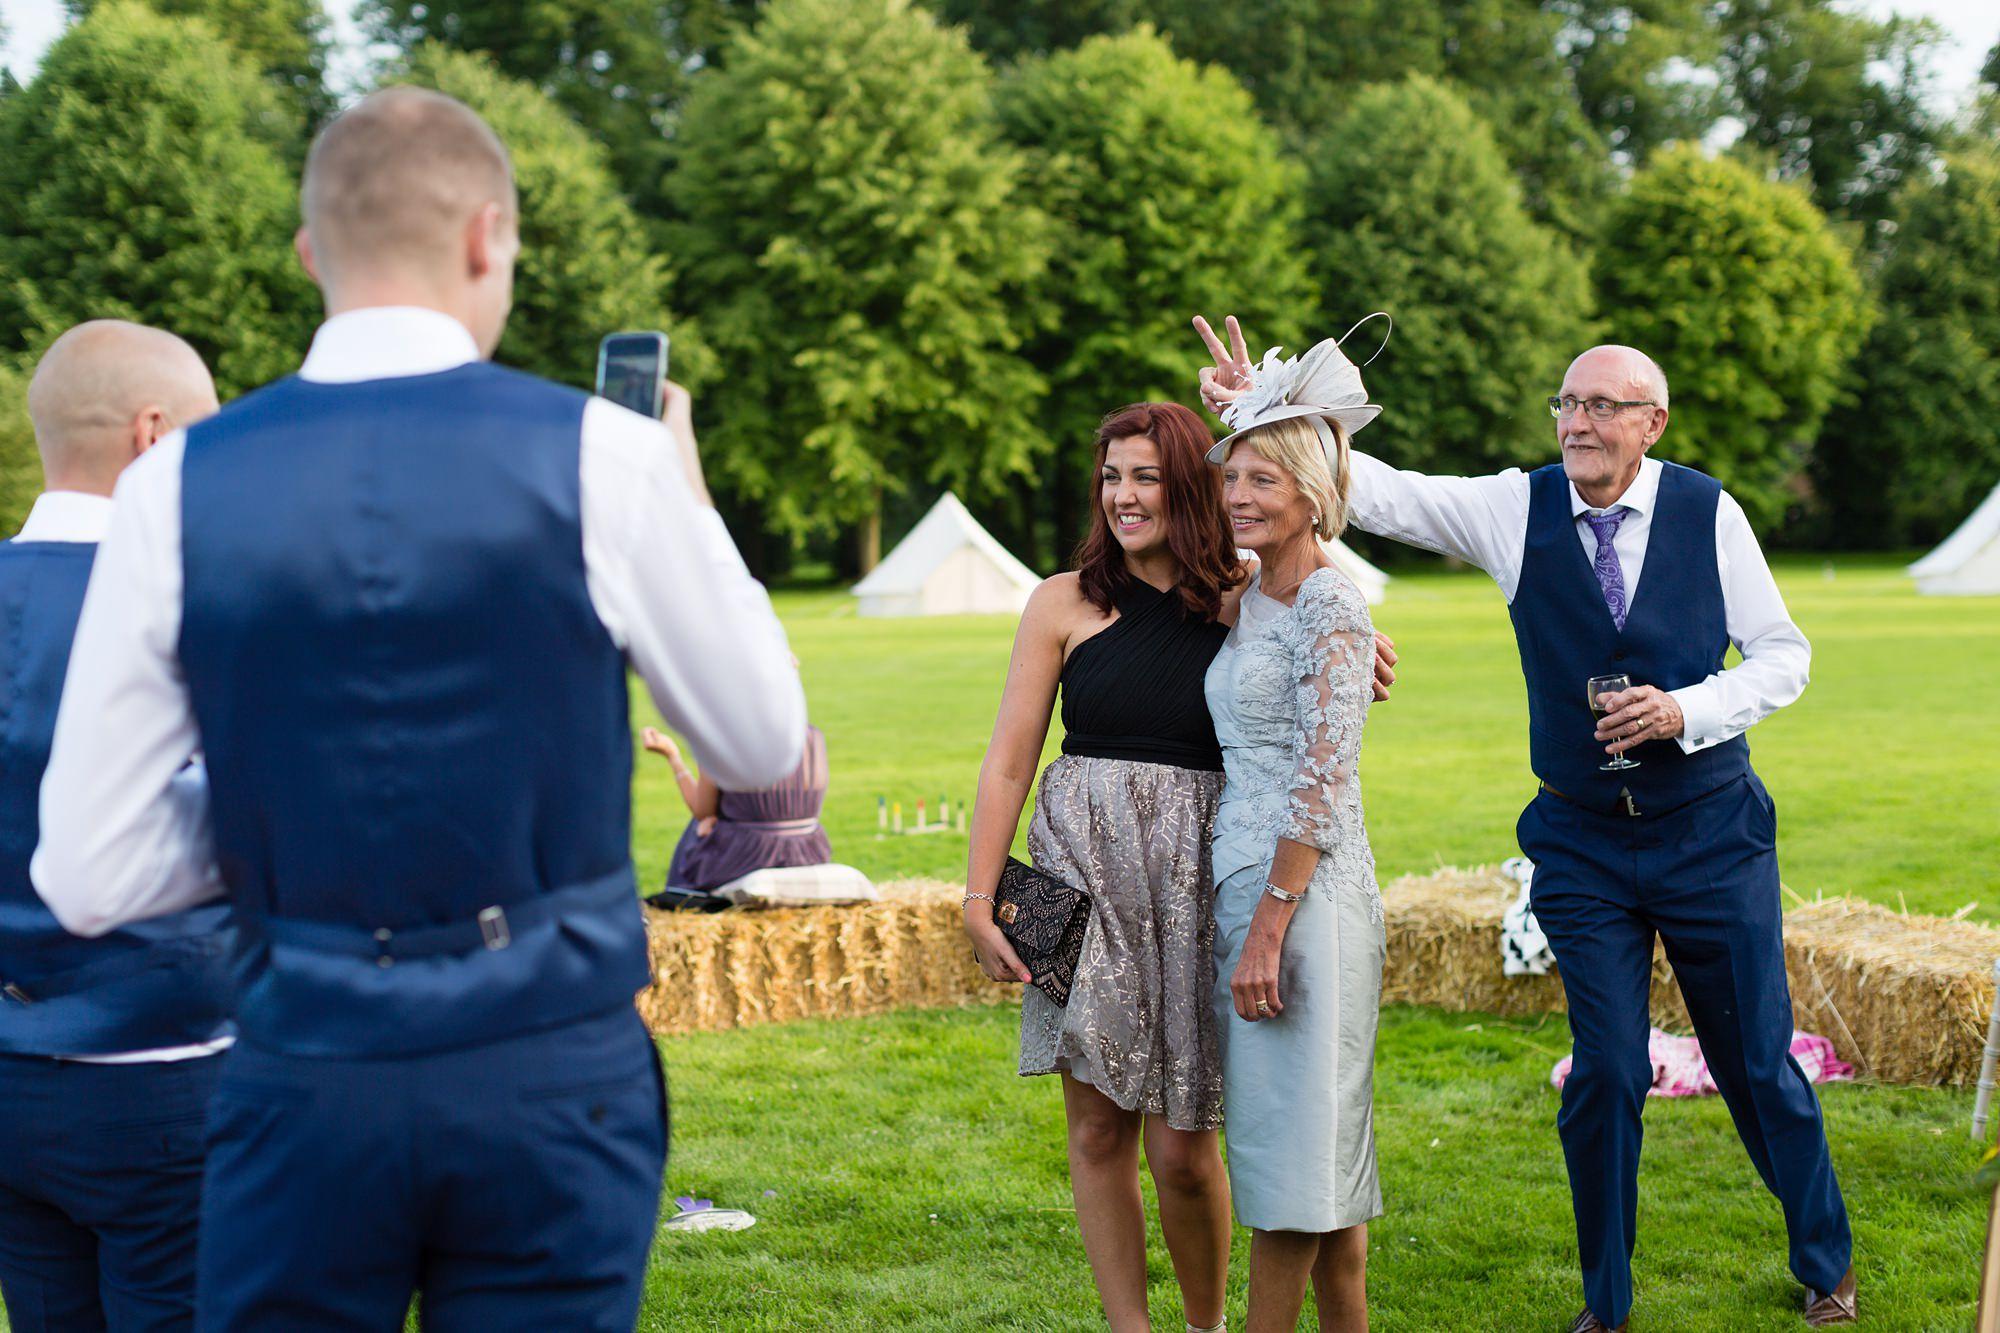 Fun wedding photography dad photobombing